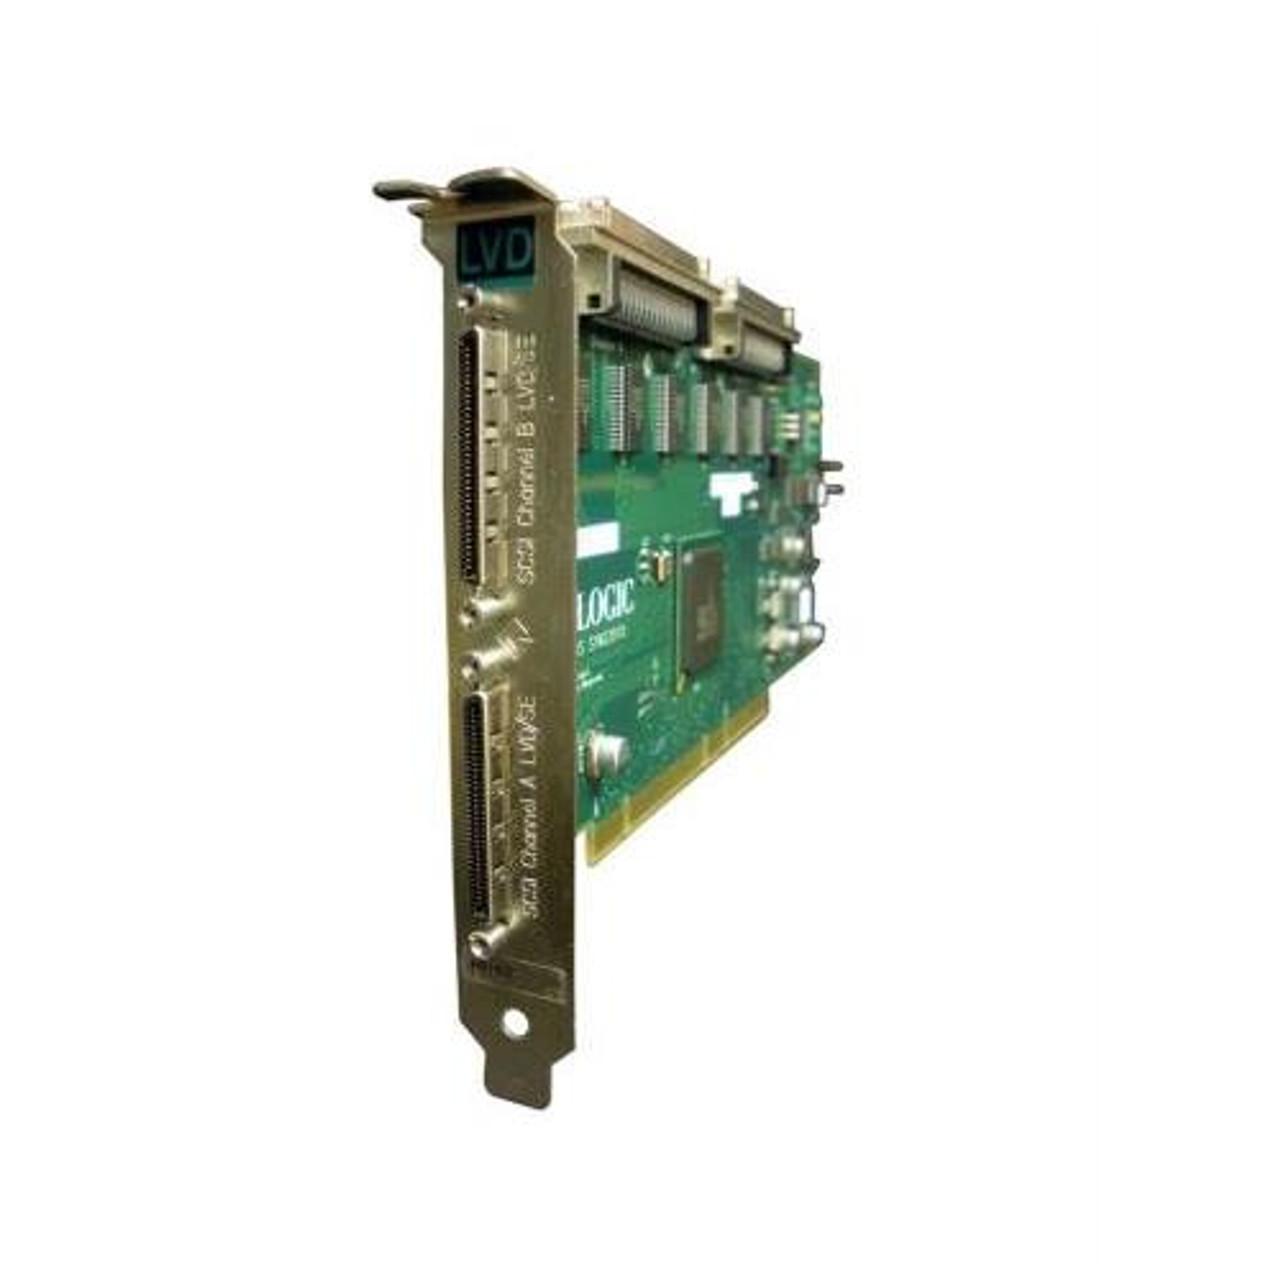 A5150A HP Dual Port Ultra2 SCSI PCI Adapter Universal PCI Up to 40MBps 2 x  68-pin HD-68 Ultra2 SCSI SCSI-2 Internal 2 x 68-pin VHDCI Ultra2 SCSI SCSI